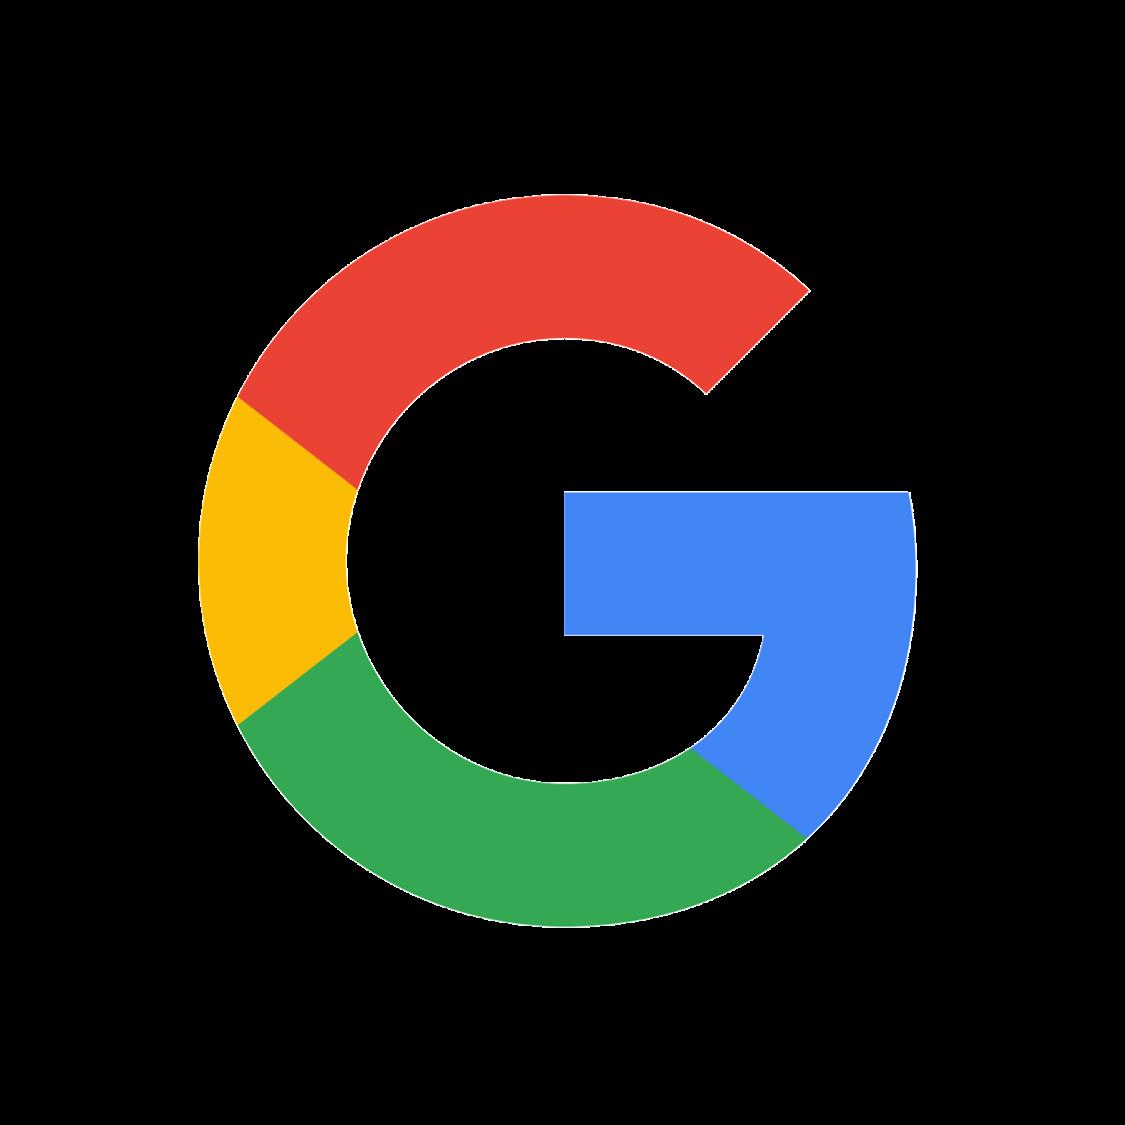 Google logo PNG images free download - Google Logo Images Free